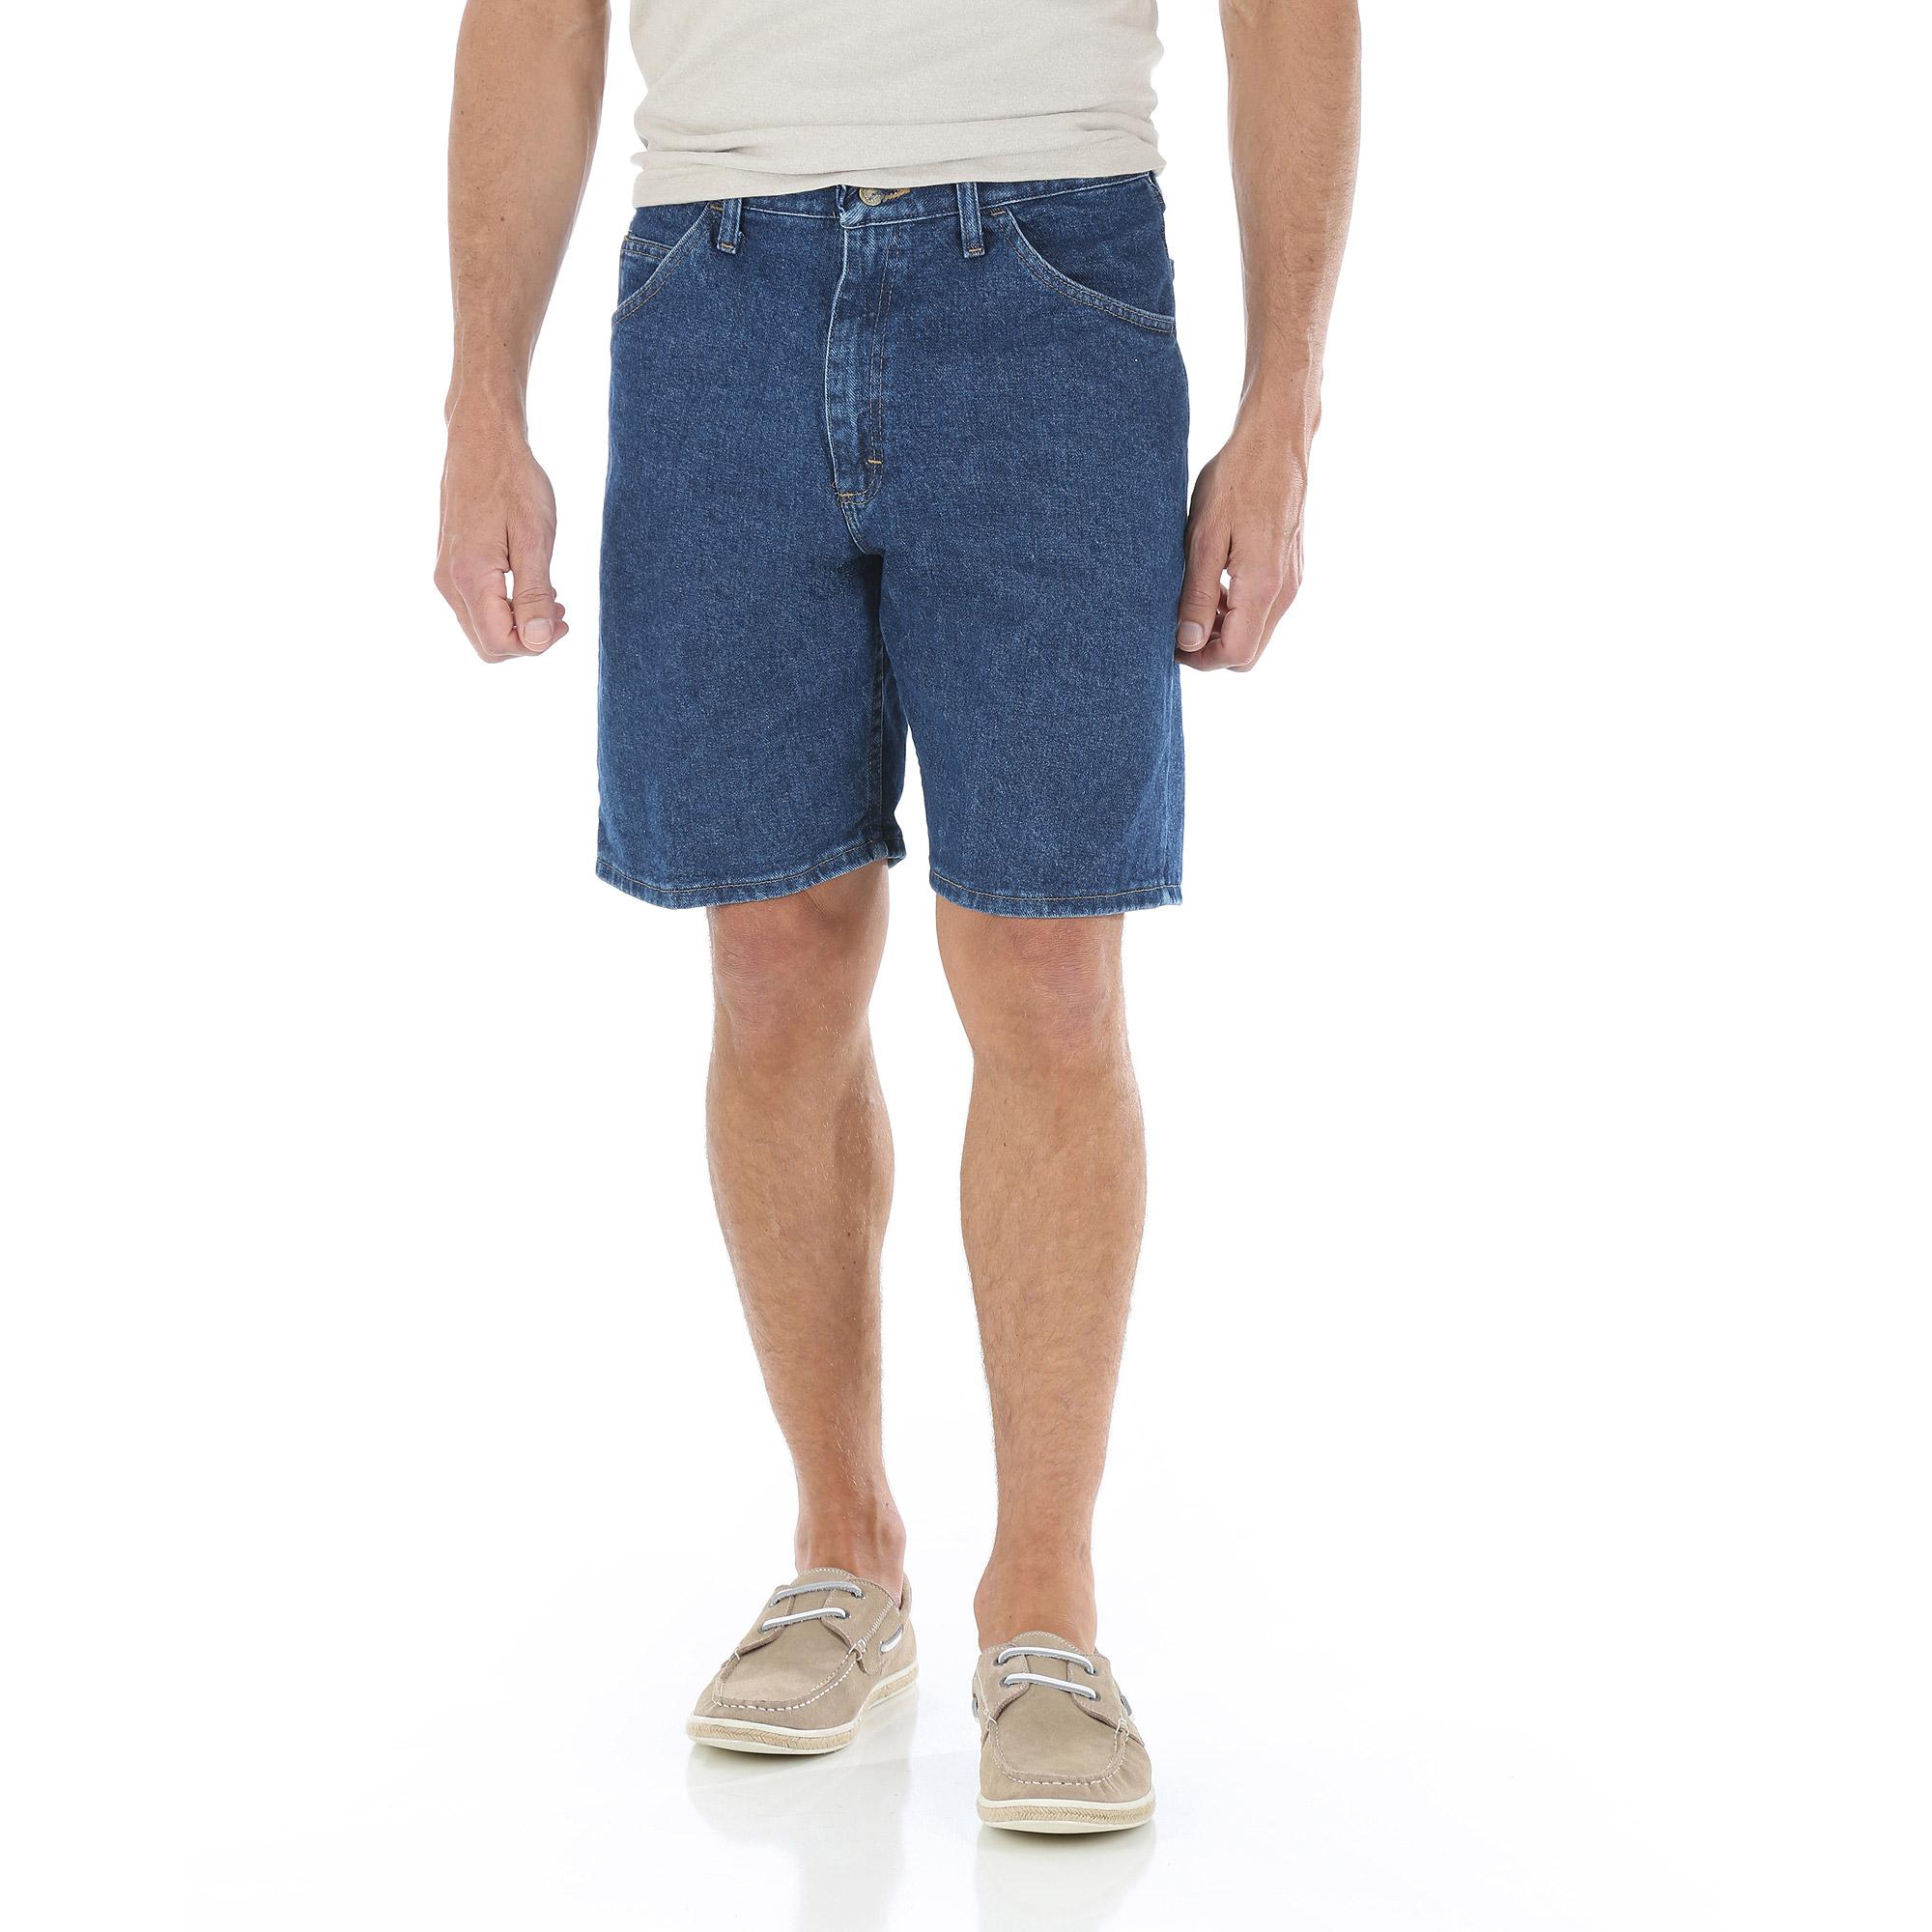 denim shorts for men product SATDFRO